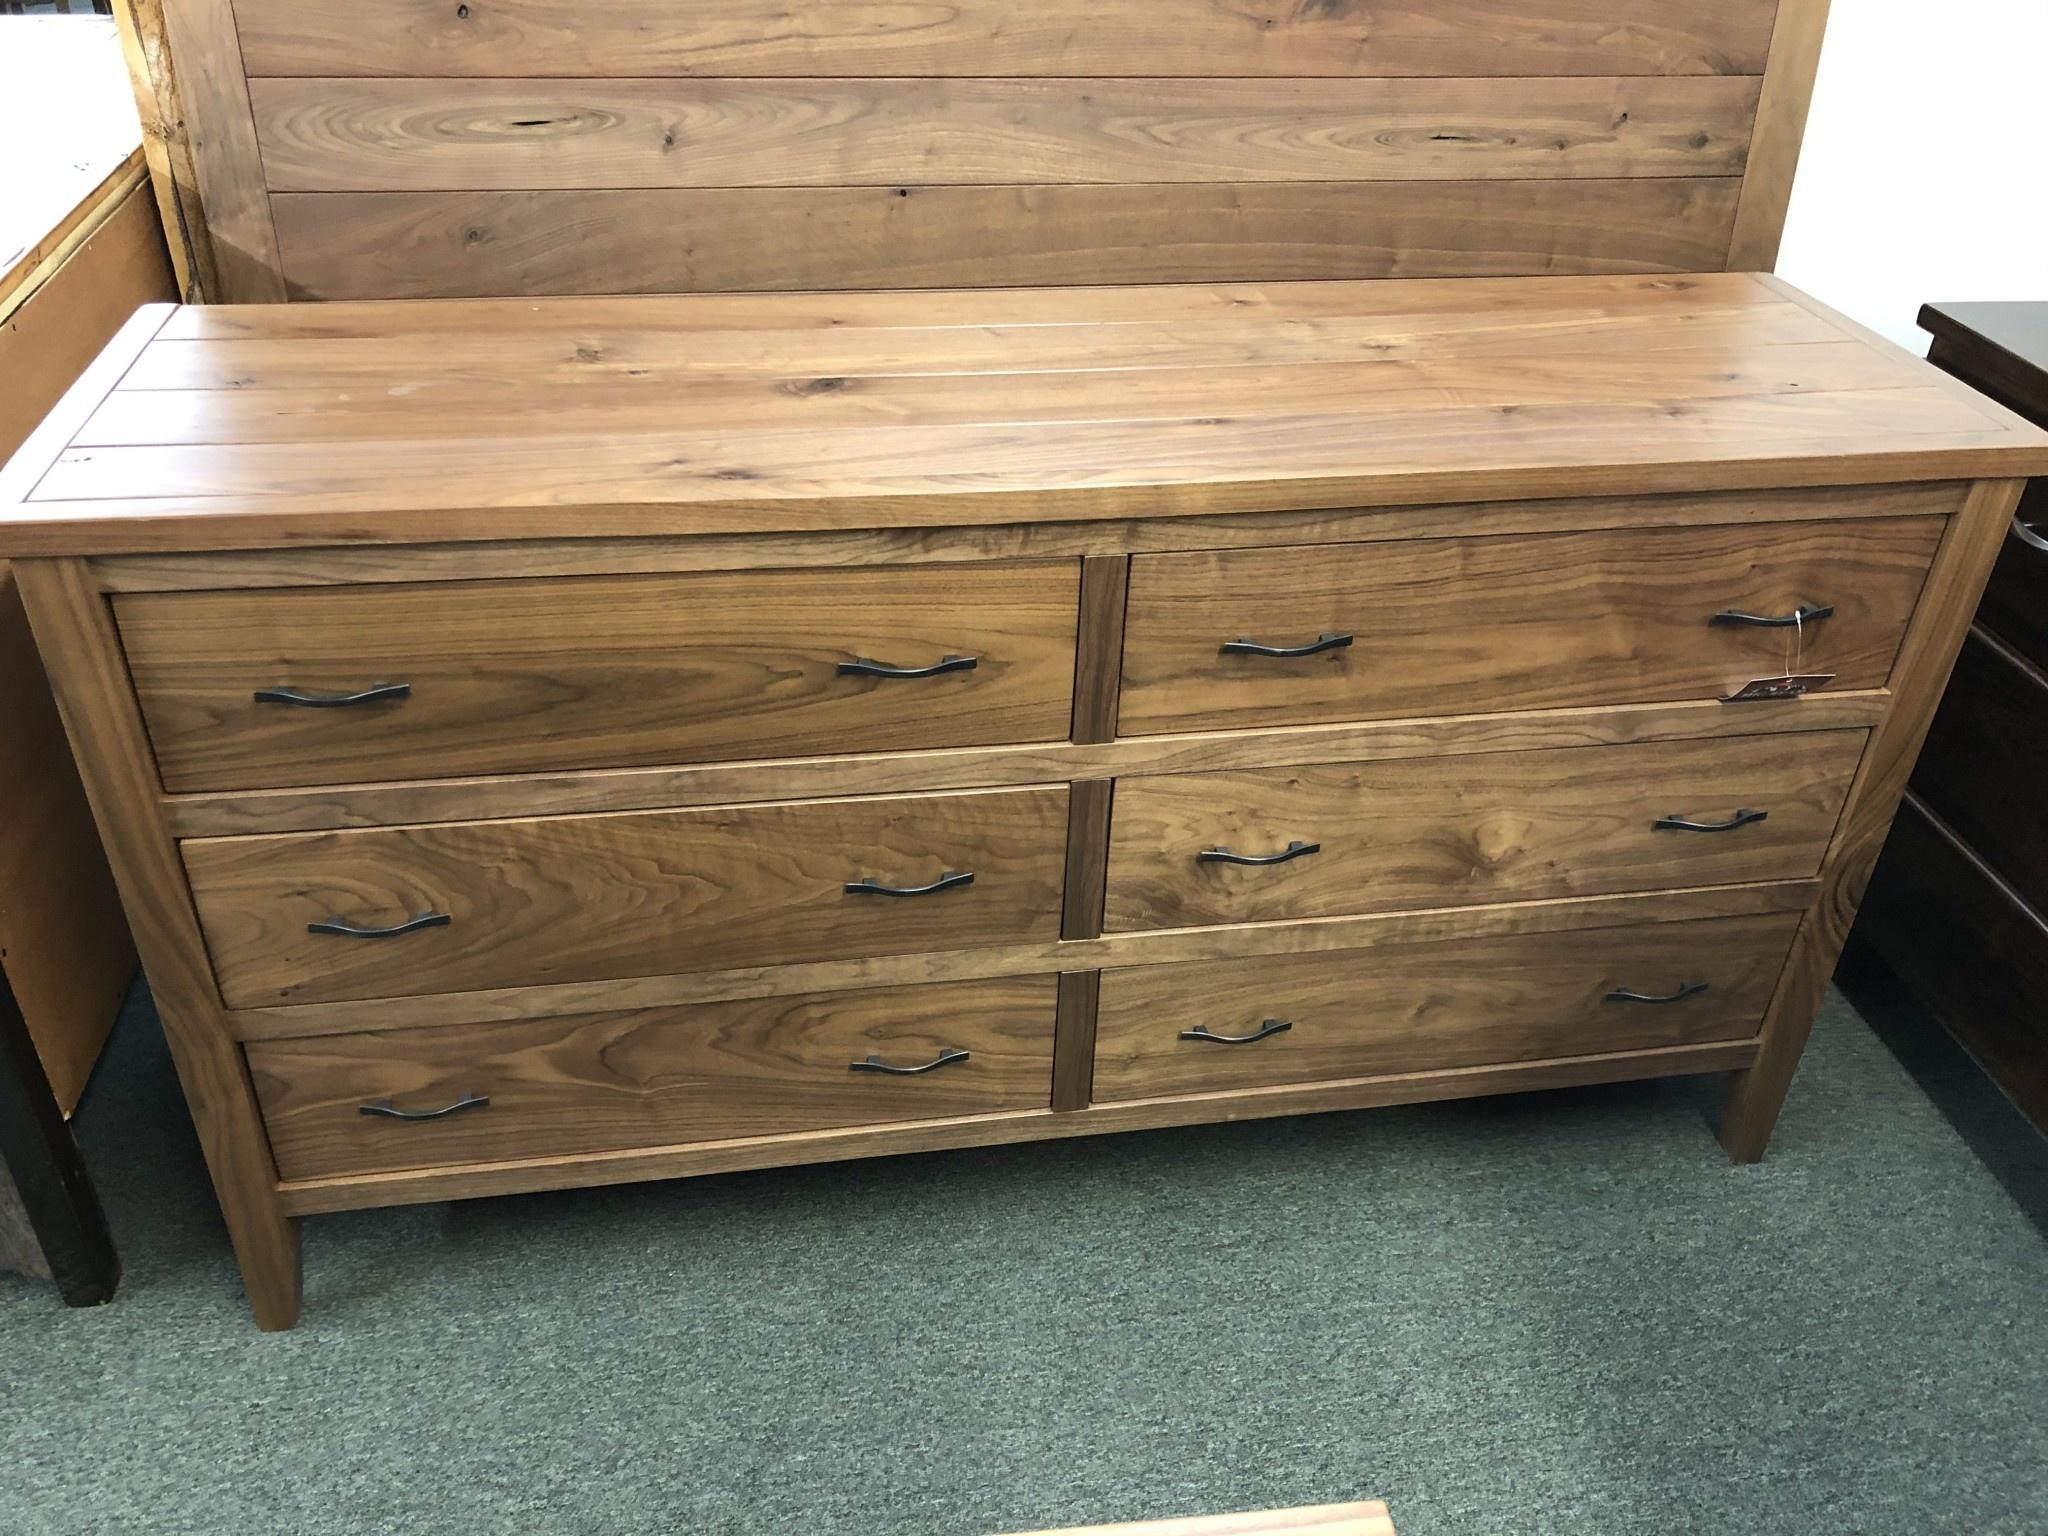 Green Gables Denver 6 Drawer Dresser-Walnut 35.5x68x20